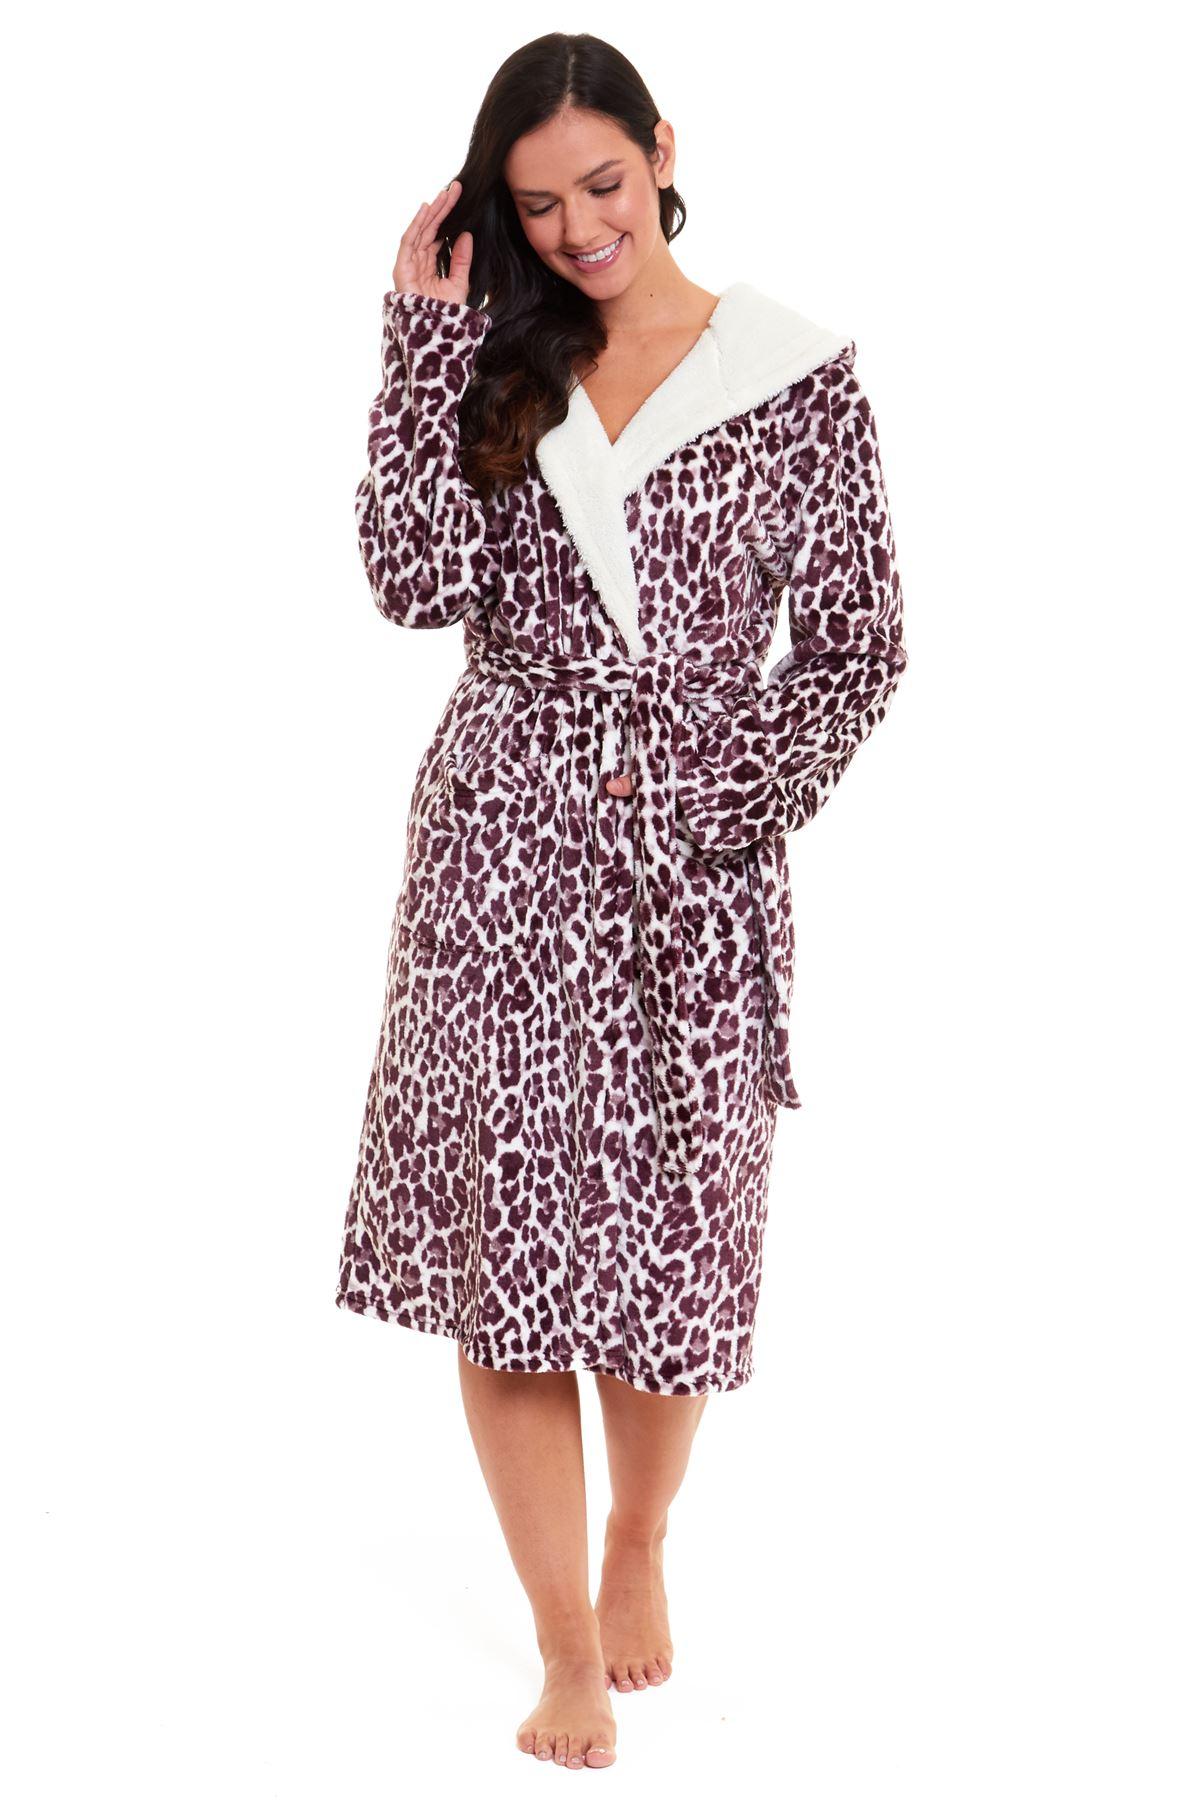 Womens Ladies Teddy Fleece Lined Dressing Gown Fluffy Snuggle Soft Warm Robe Ebay